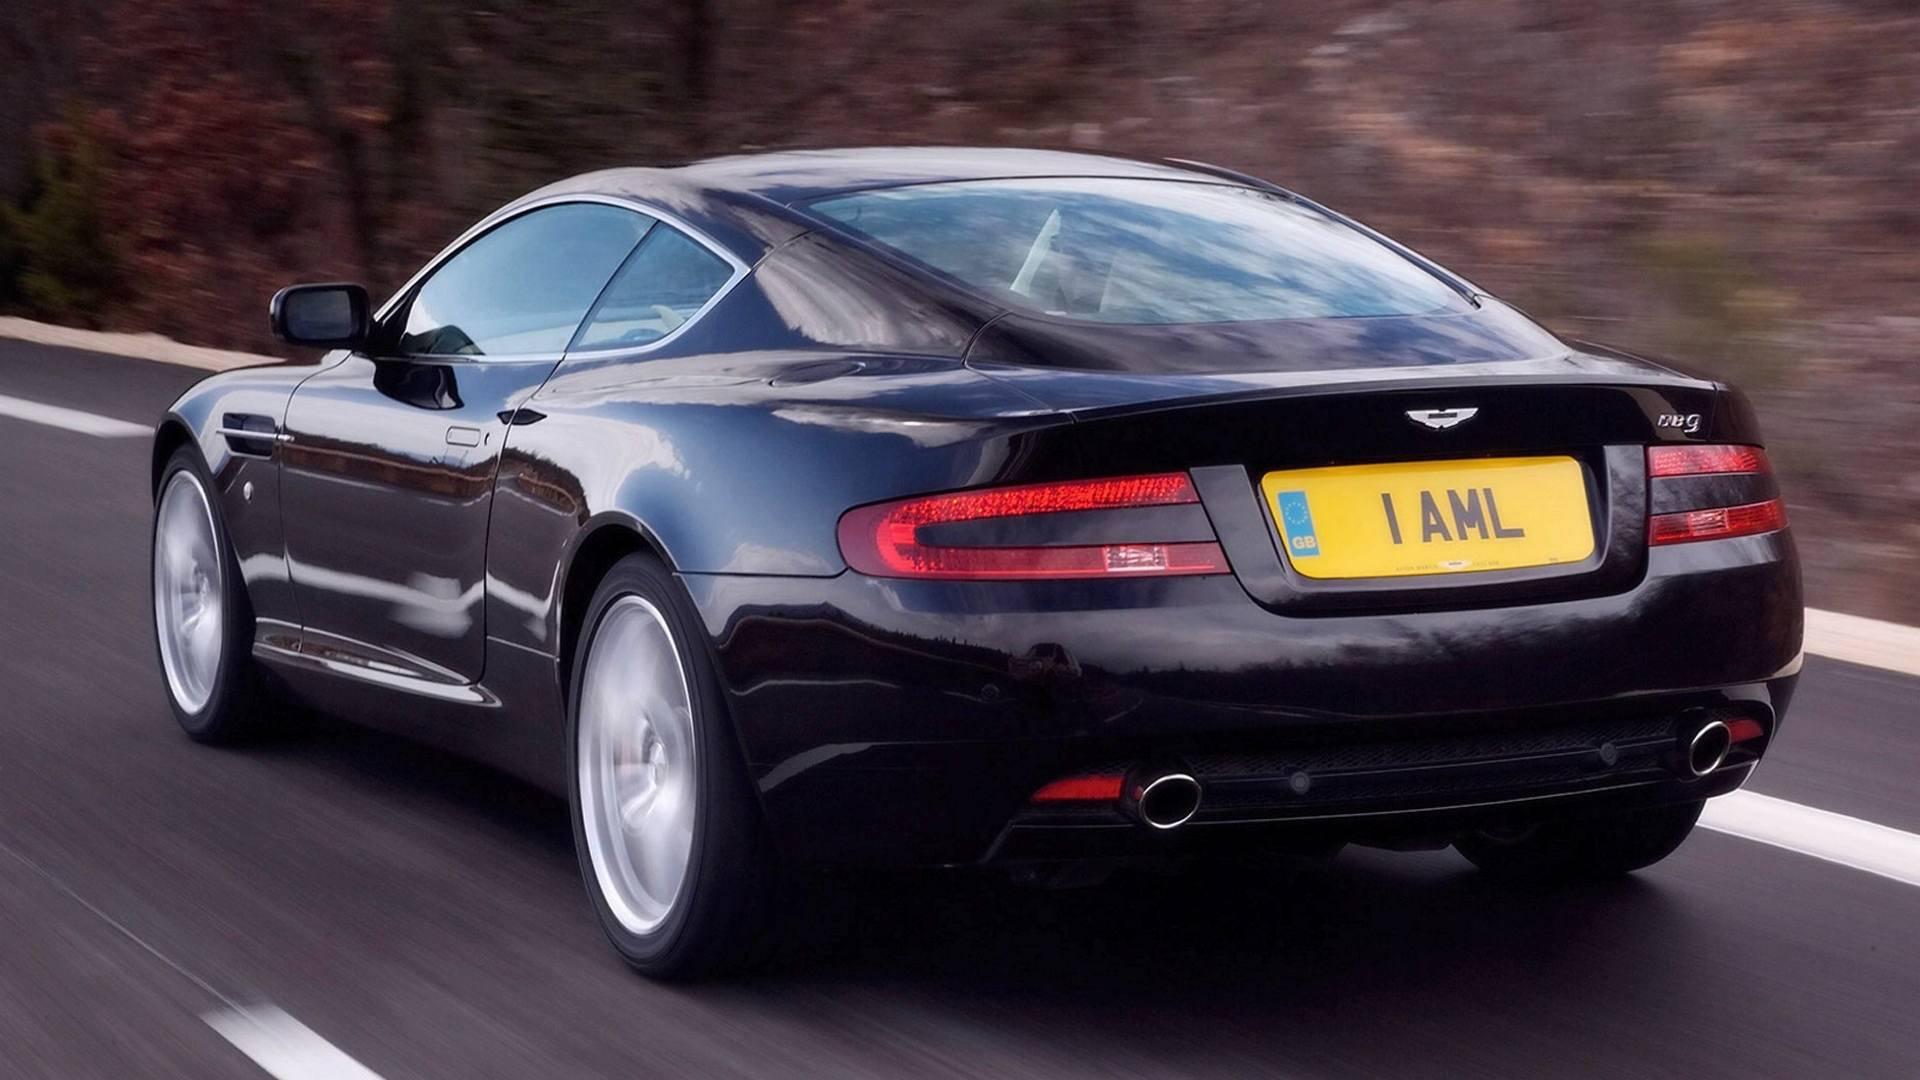 Aston Martin Db9 Wallpapers Wallpaper World